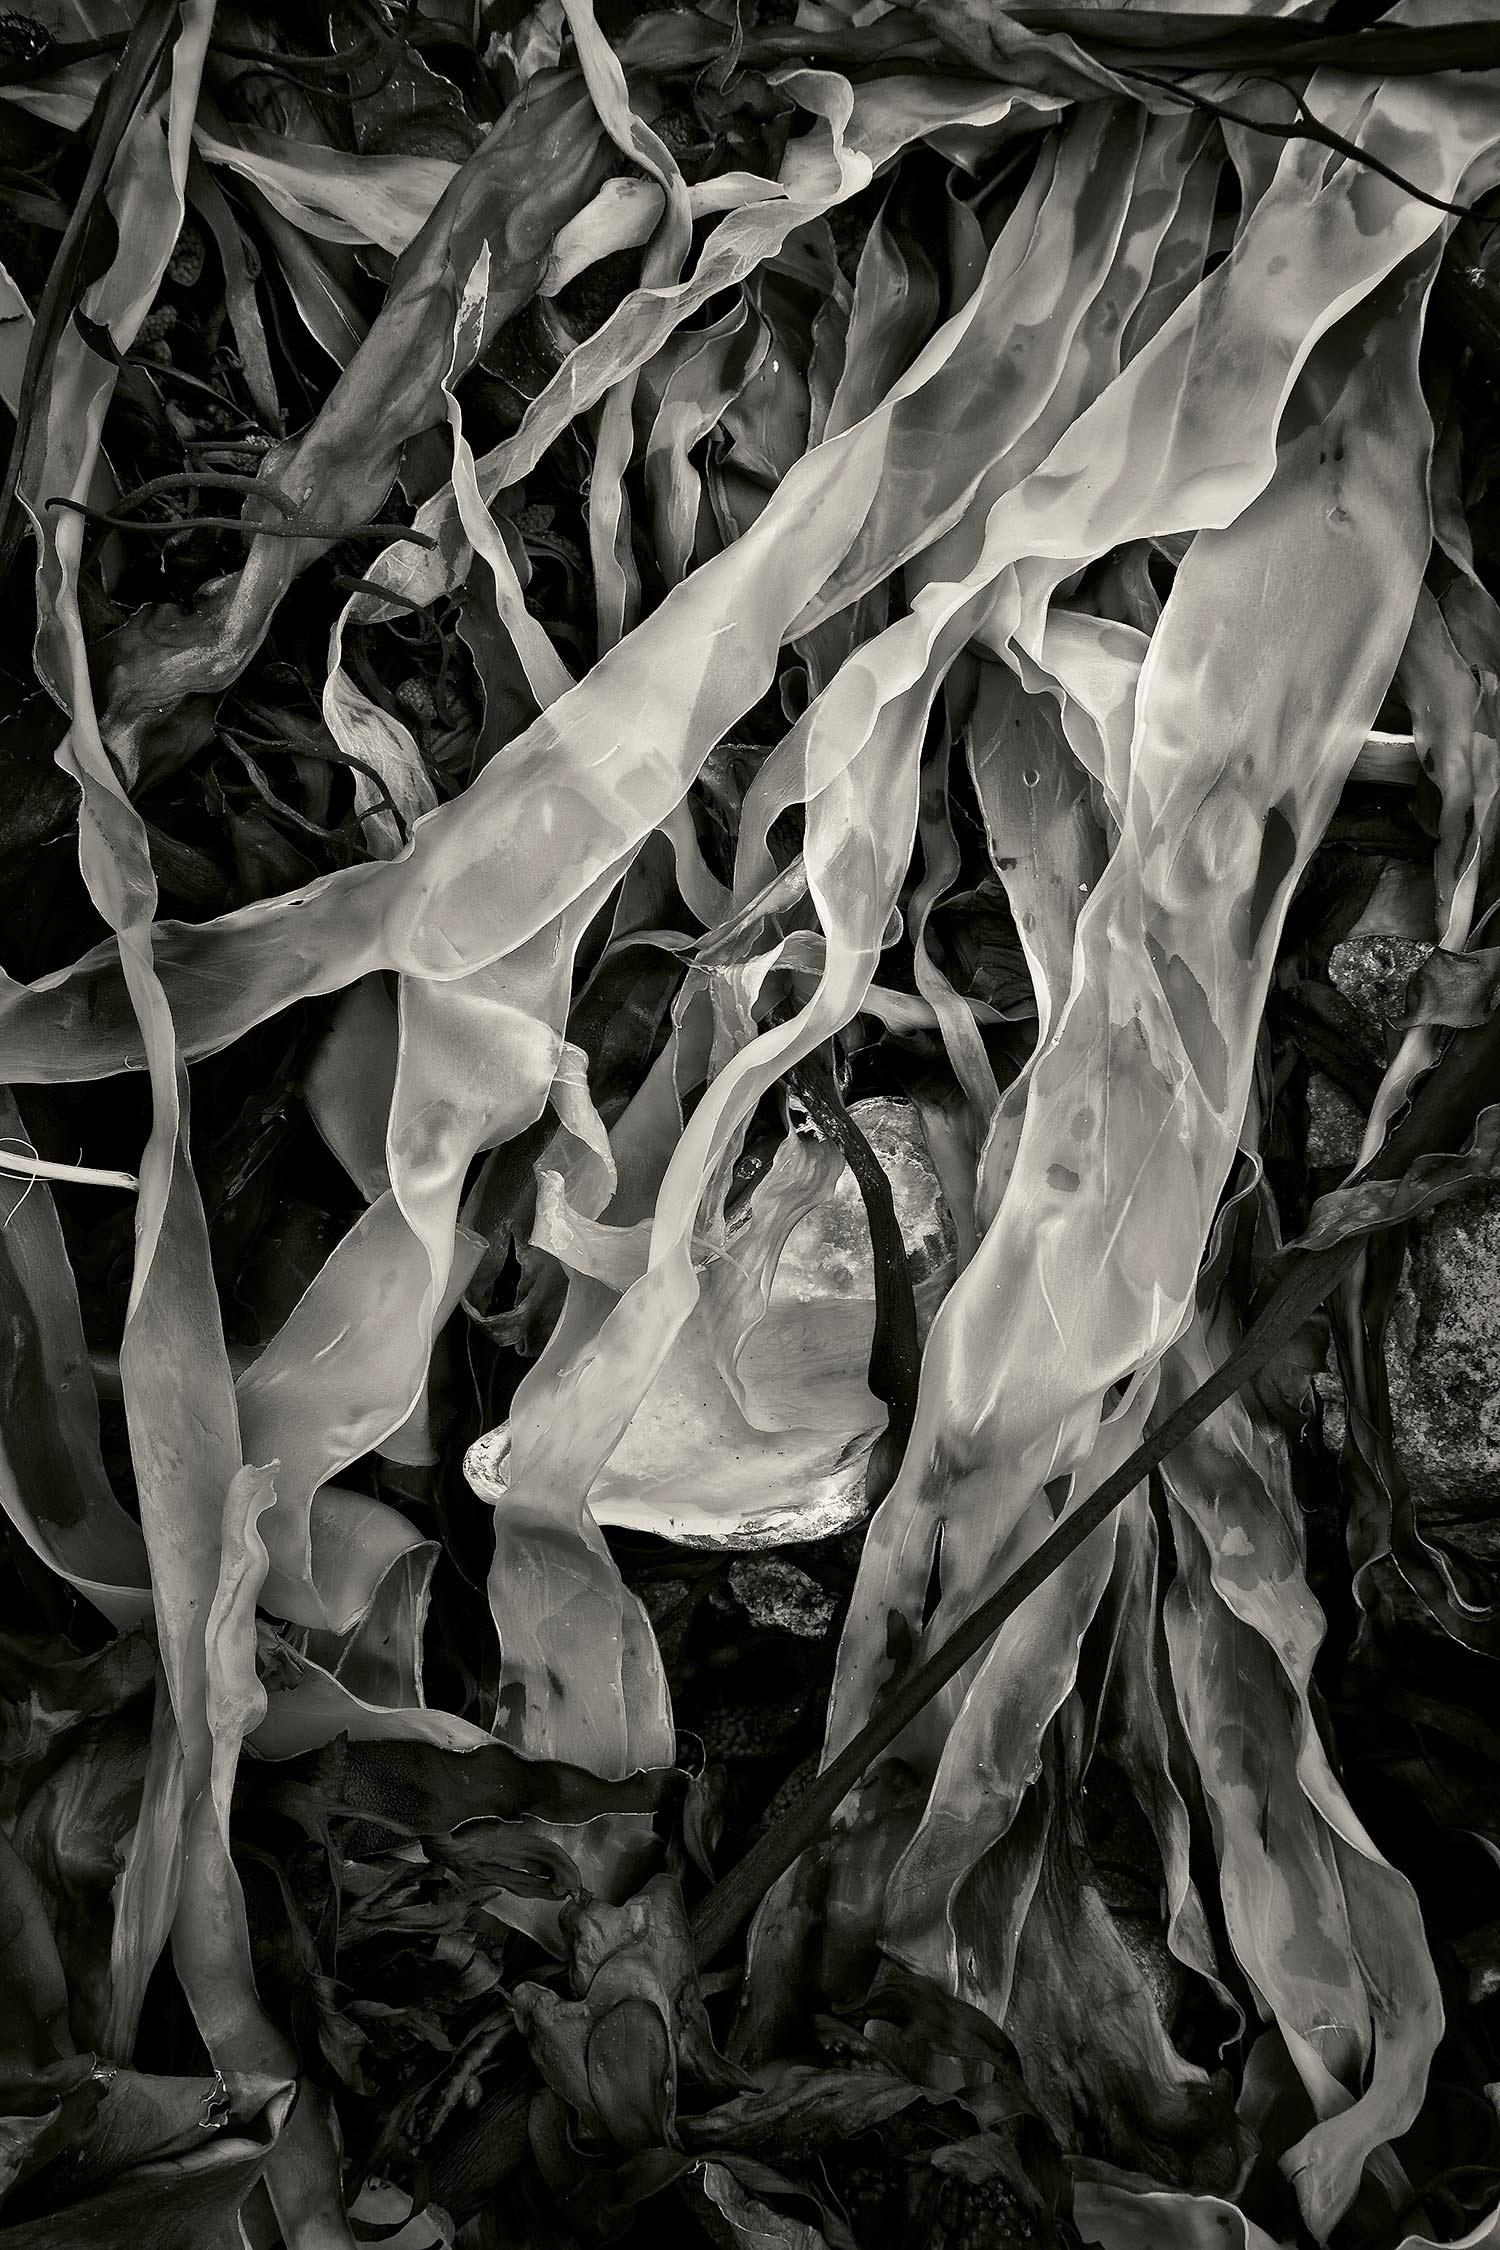 Seaweed 4, Seawall, Maine, 2011